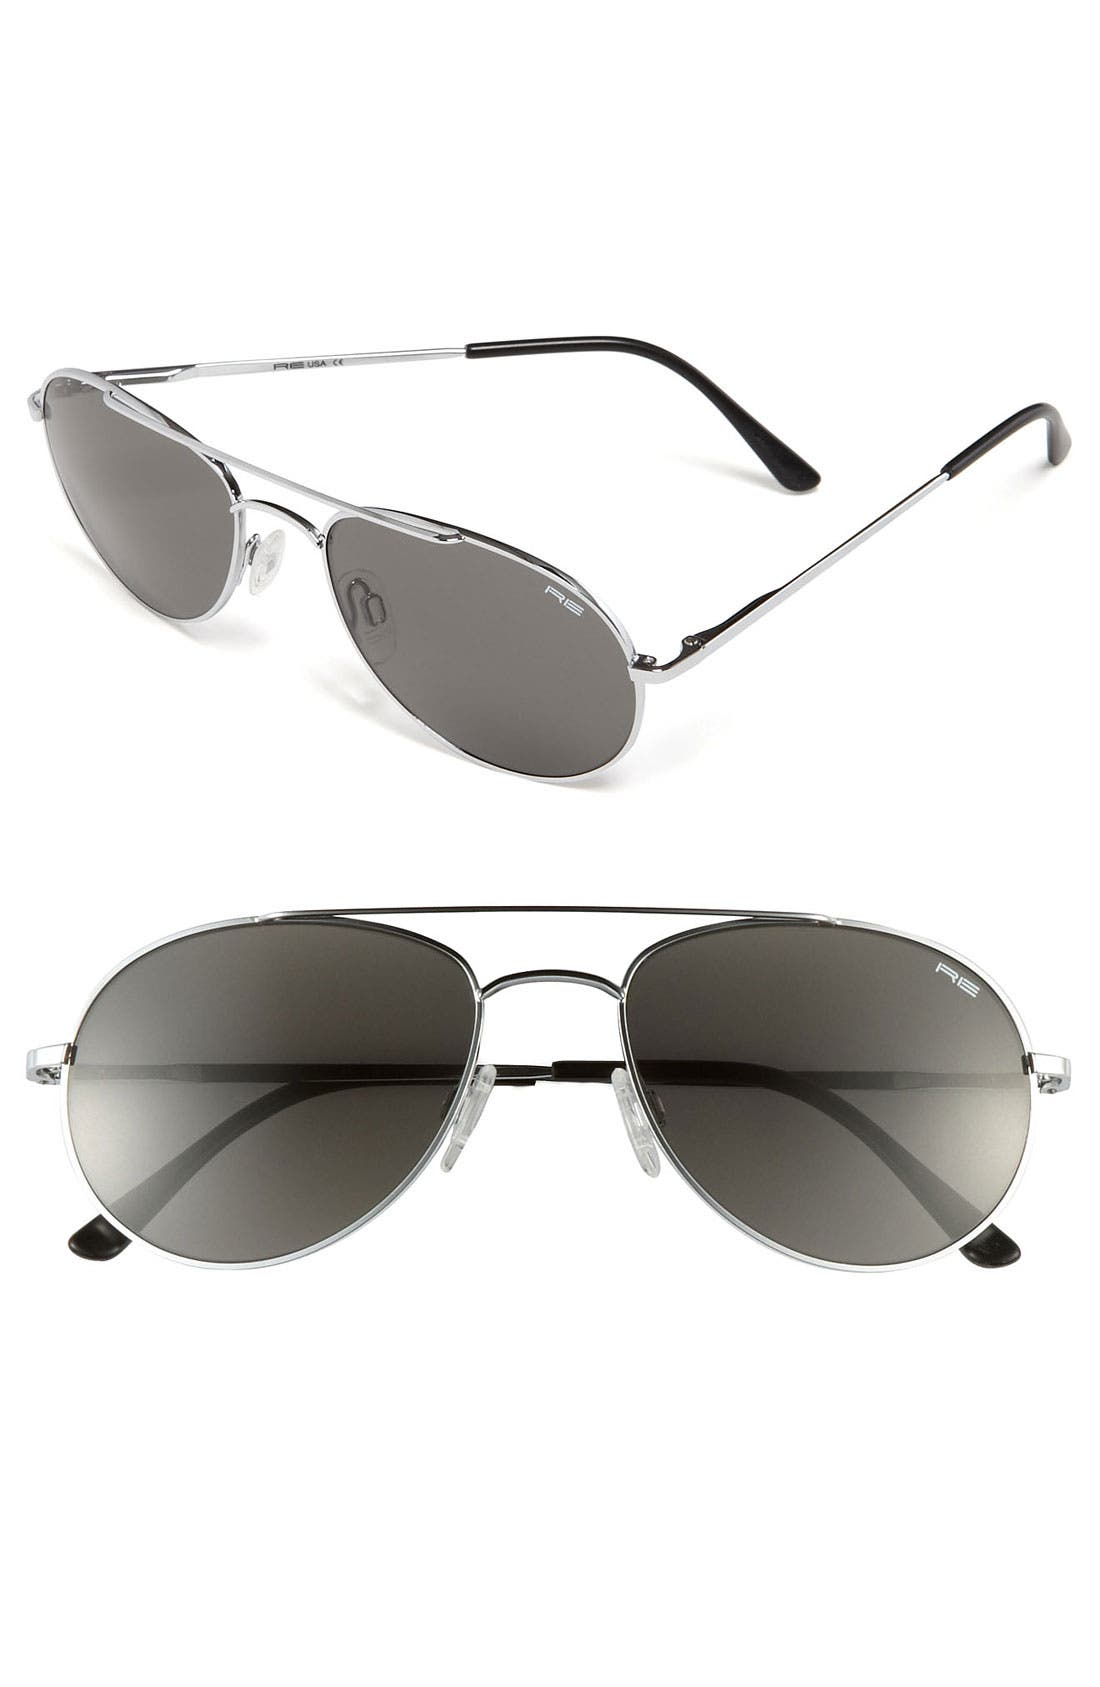 Alternate Image 1 Selected - Randolph Engineering 'Crew Chief' 54mm Sunglasses